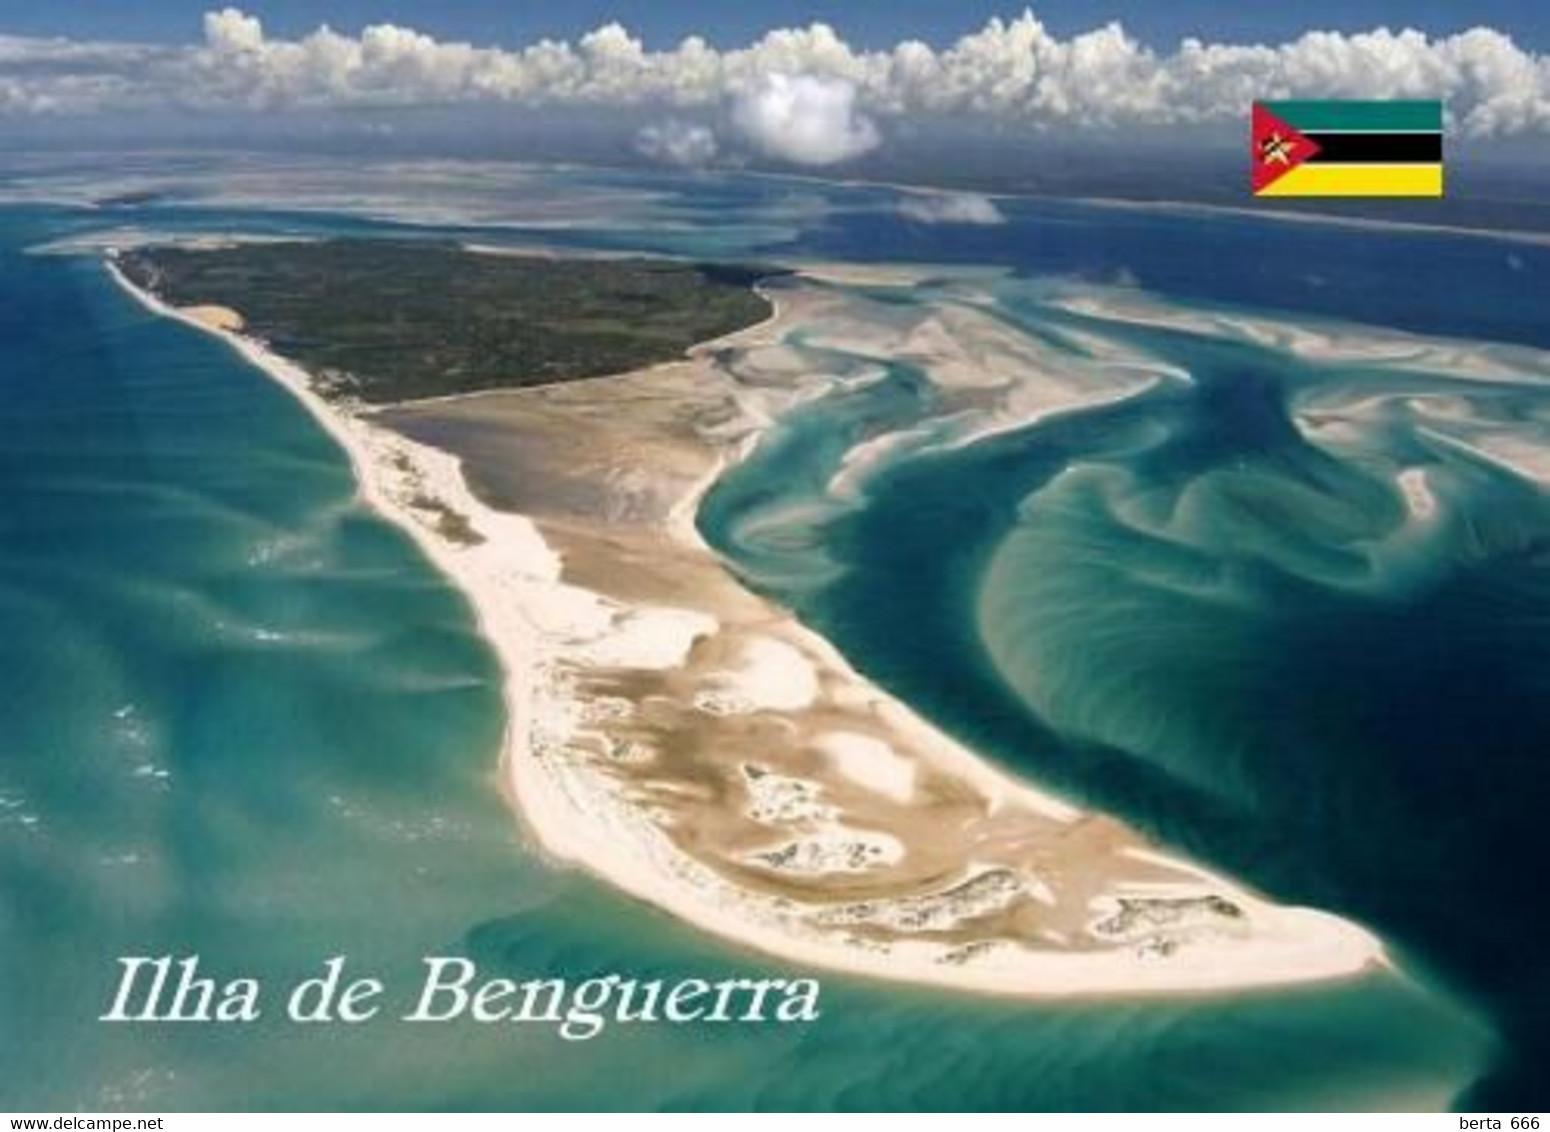 Mozambique Benguerra Island Aerial View New Postcard Mosambik AK - Mozambique